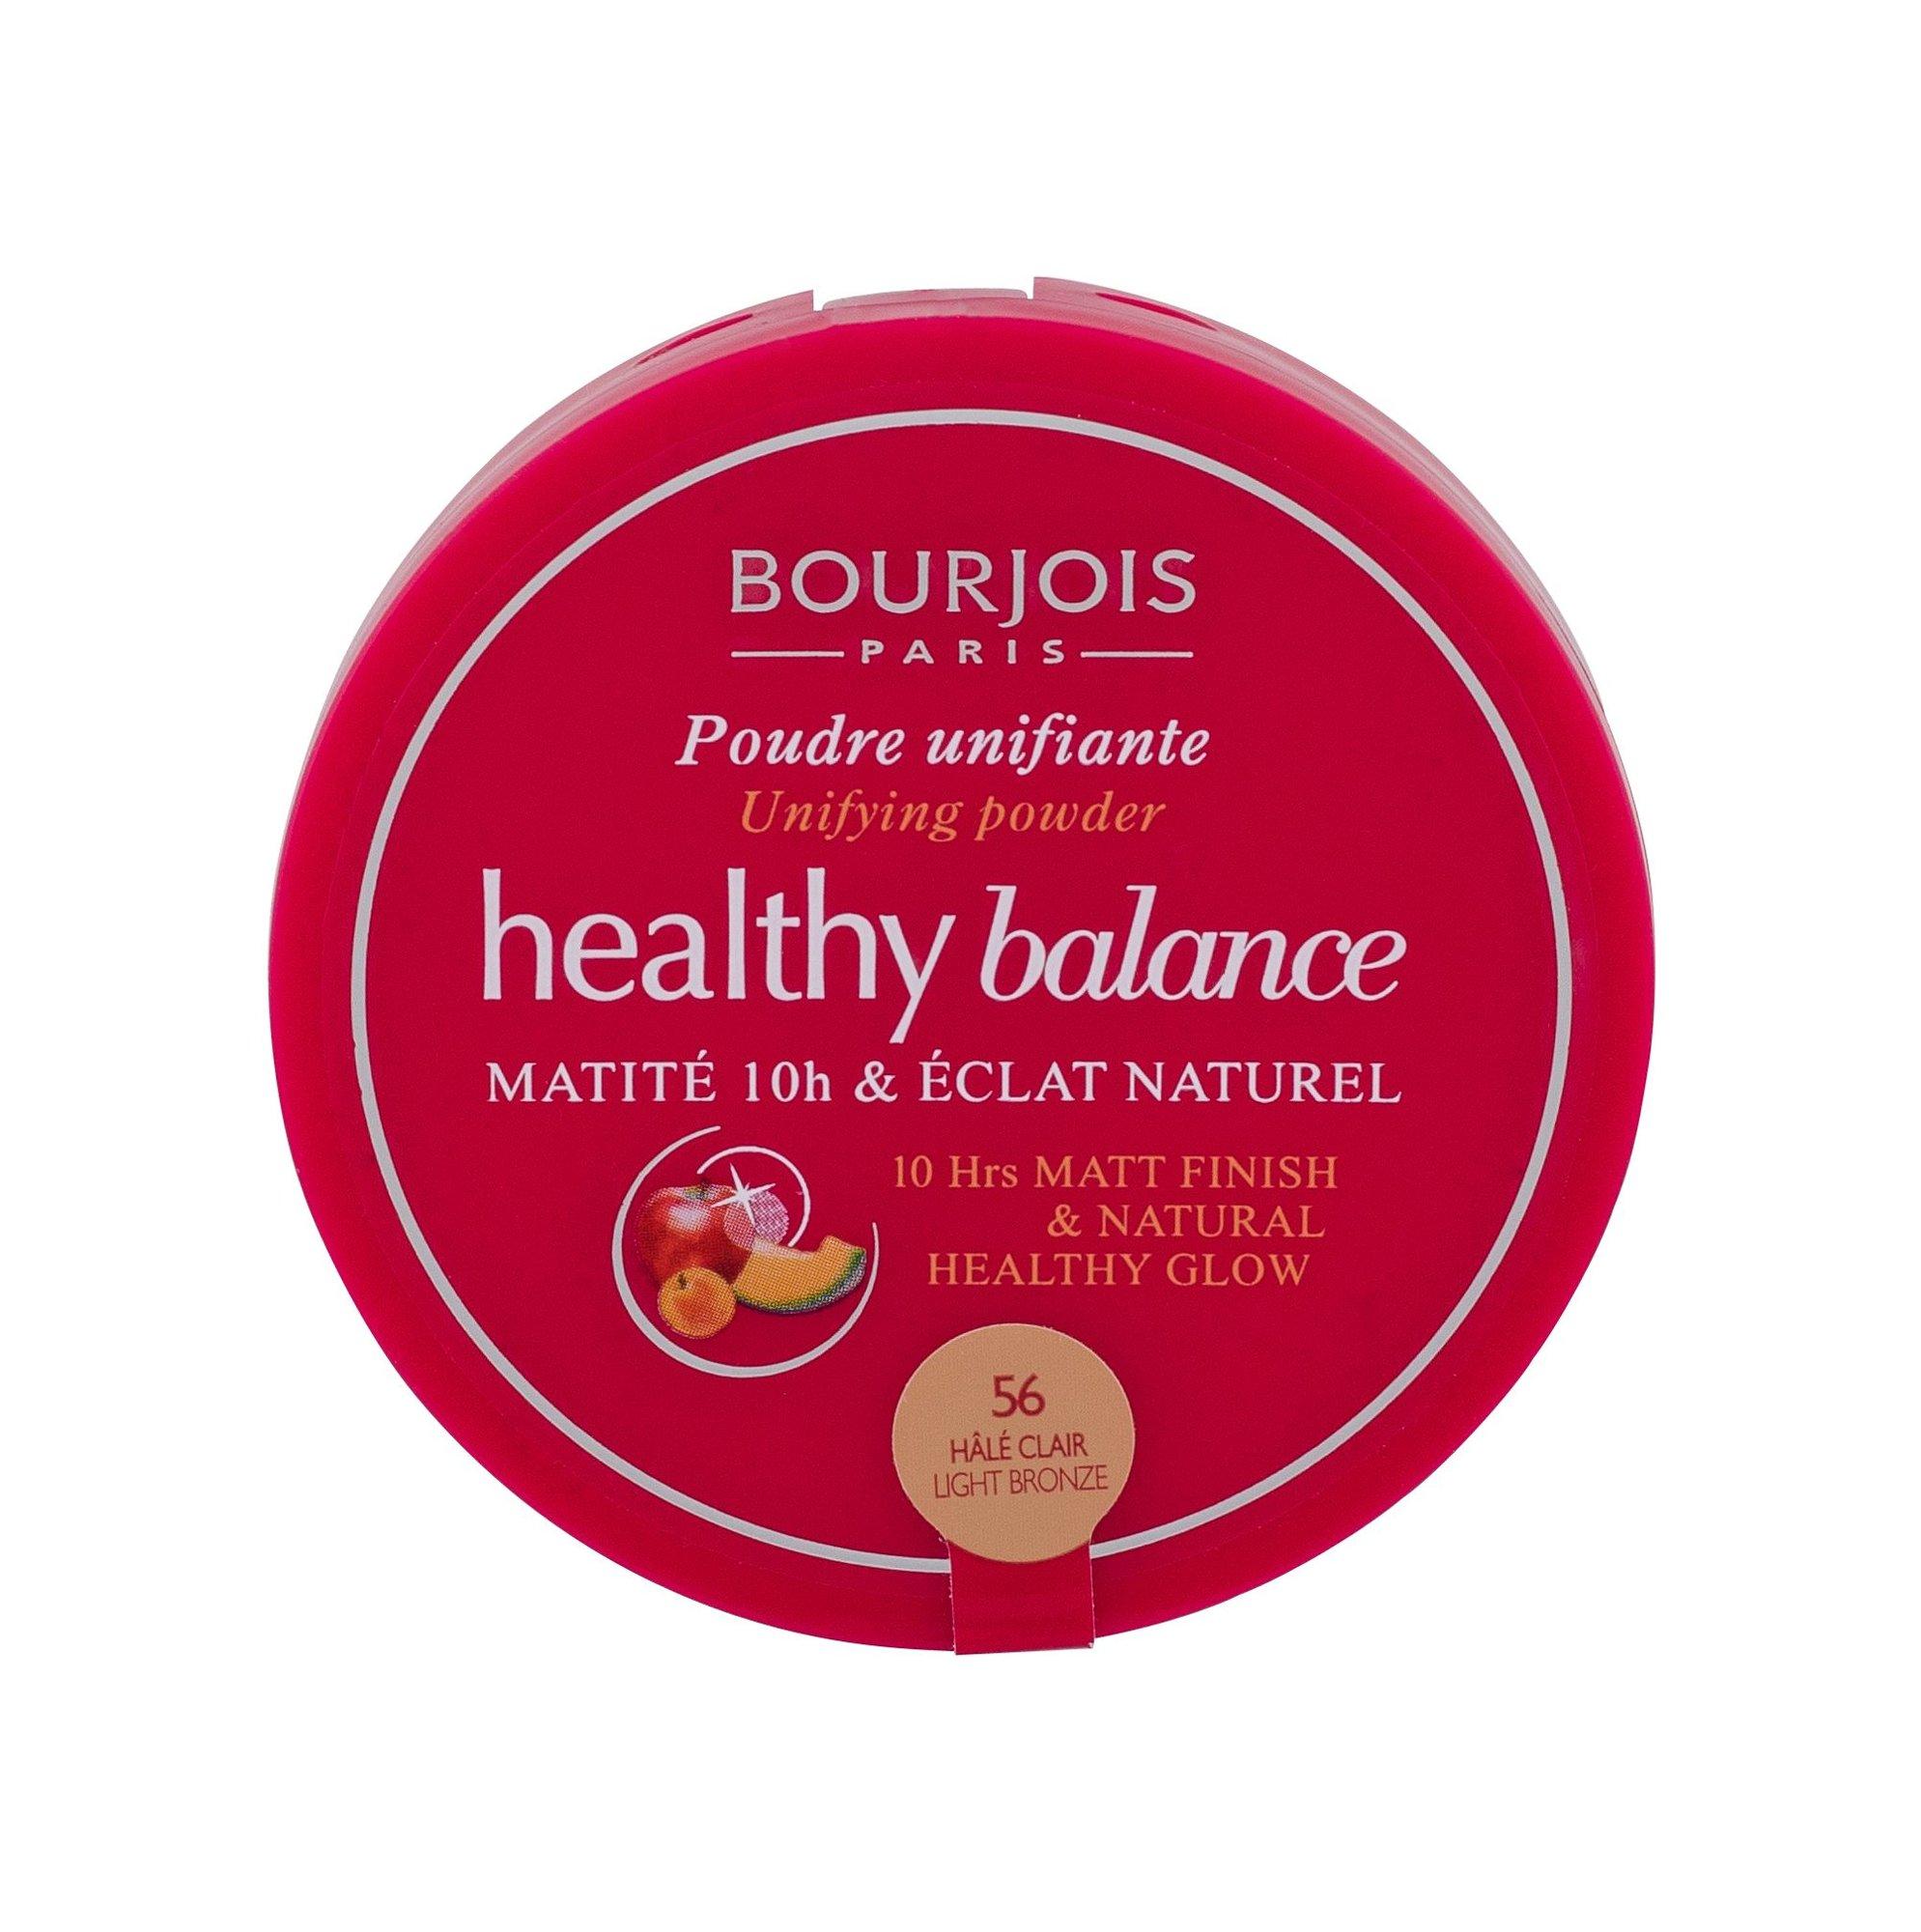 BOURJOIS Paris Healthy Balance Cosmetic 9ml 56 Light Bronze